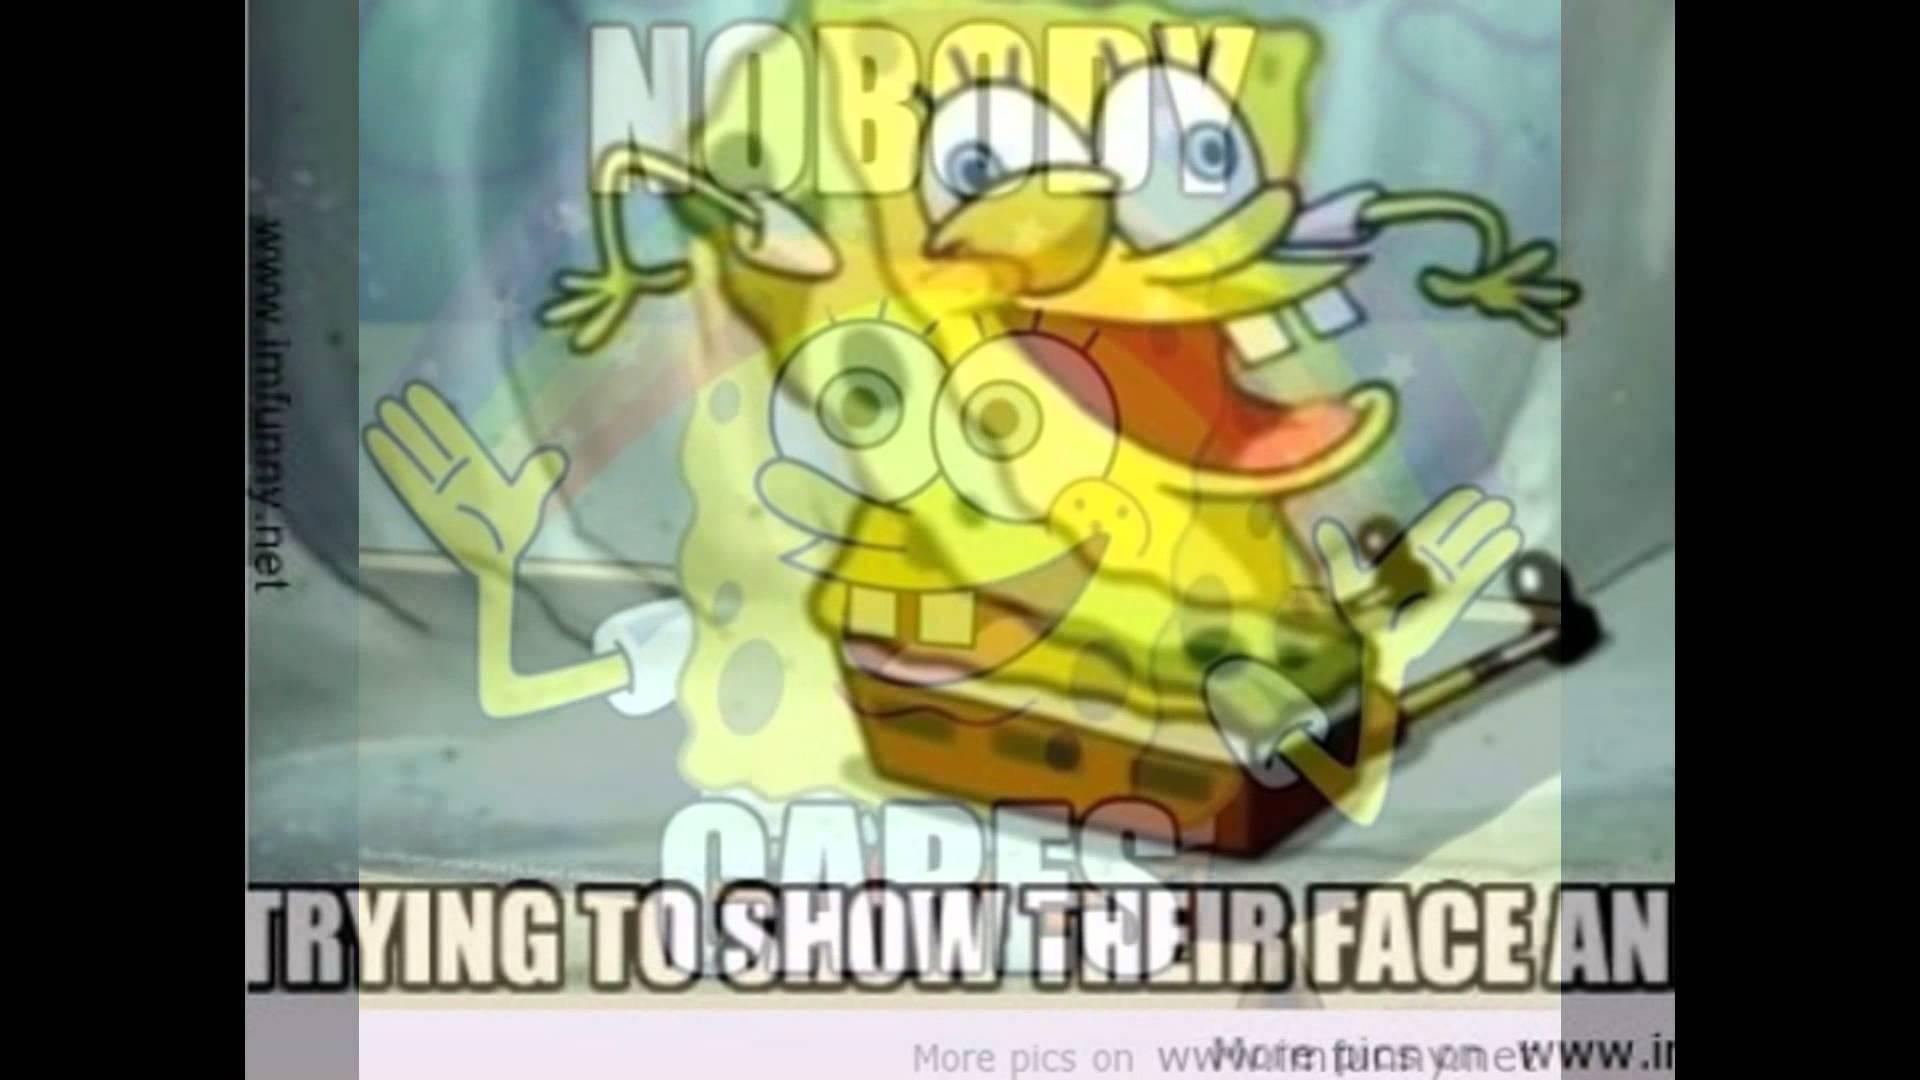 Hilarious spongebob memes